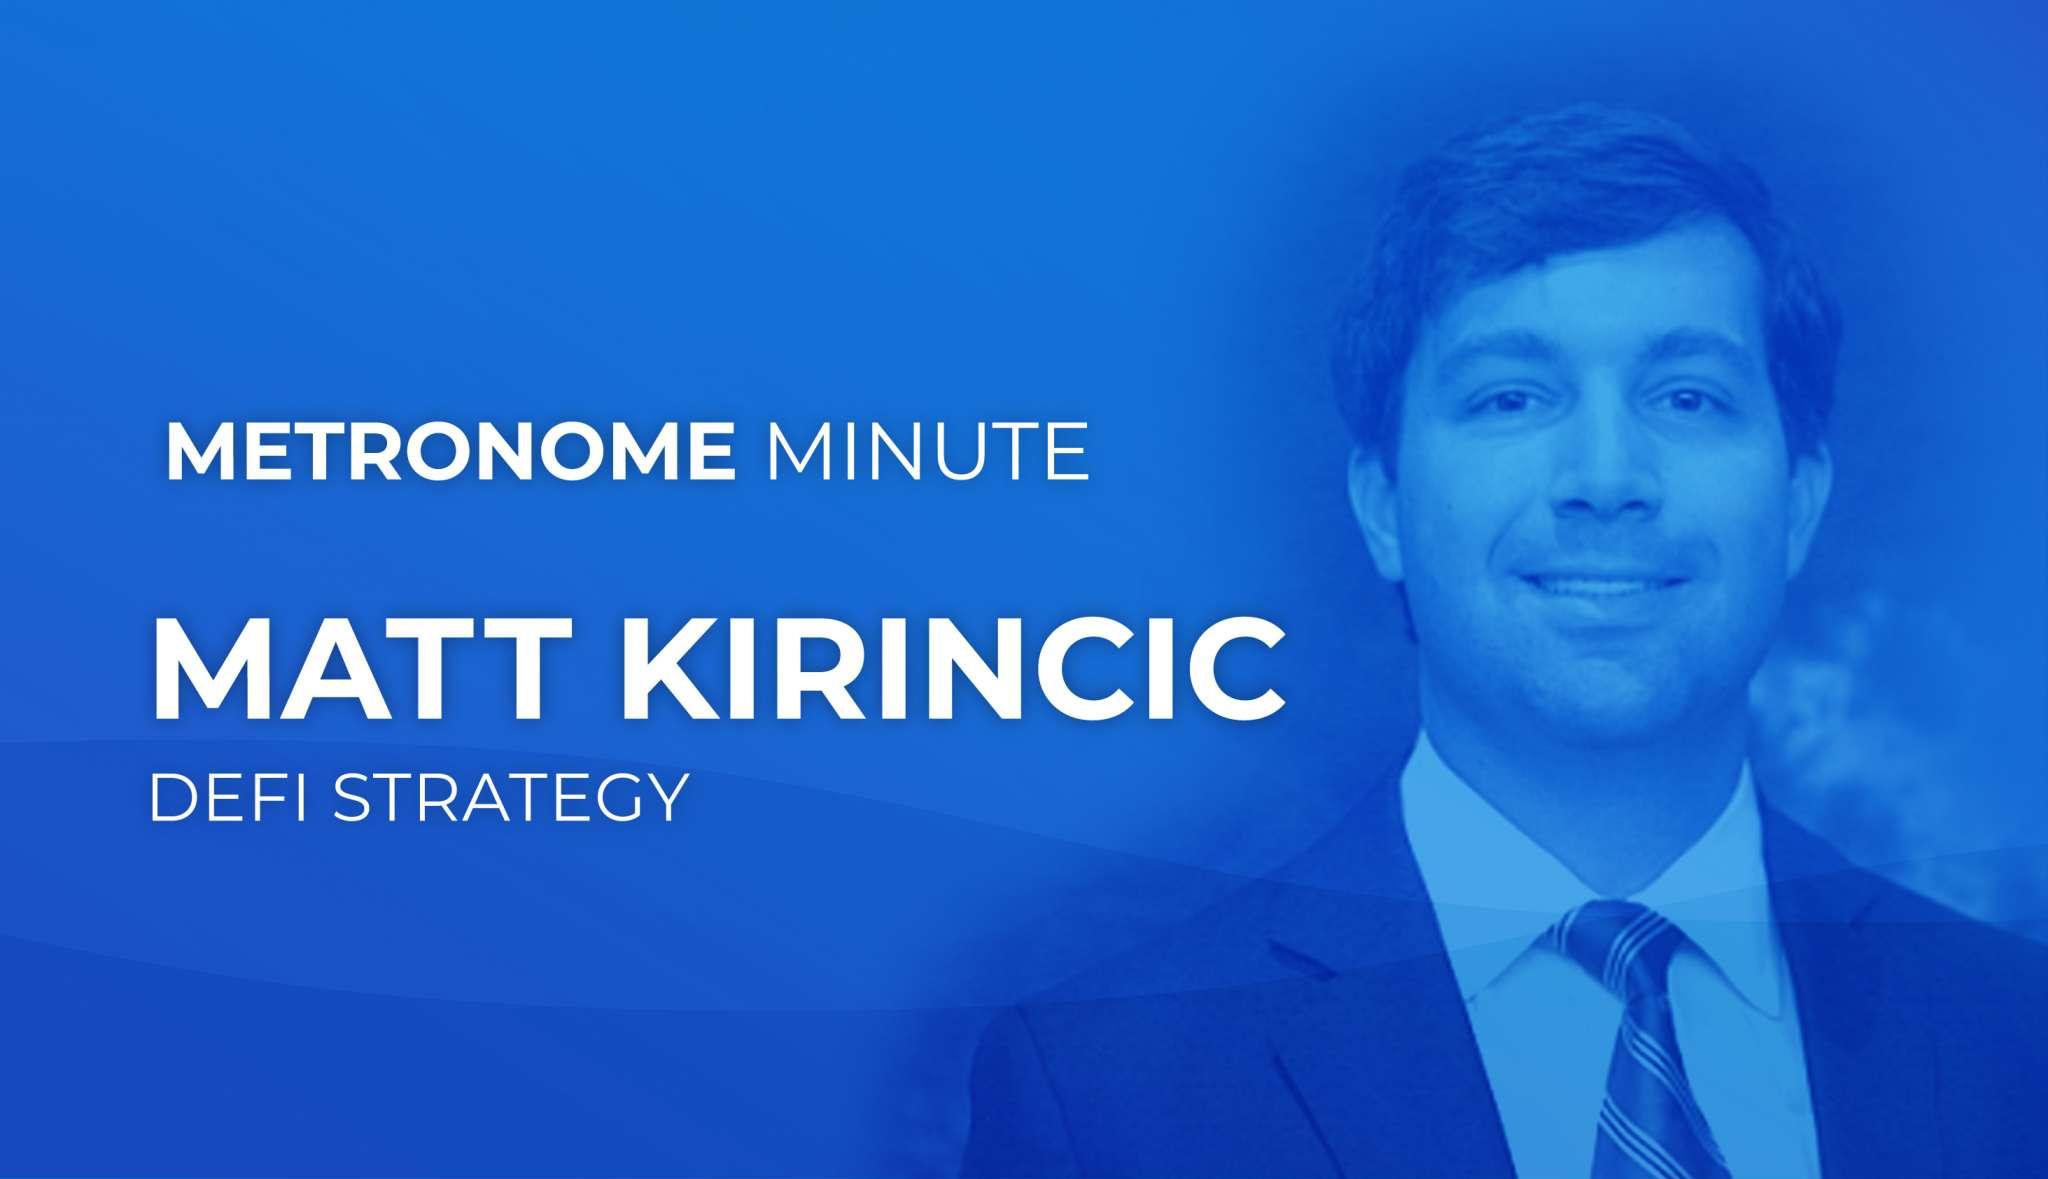 Metronome Minute: Matt Kirincic